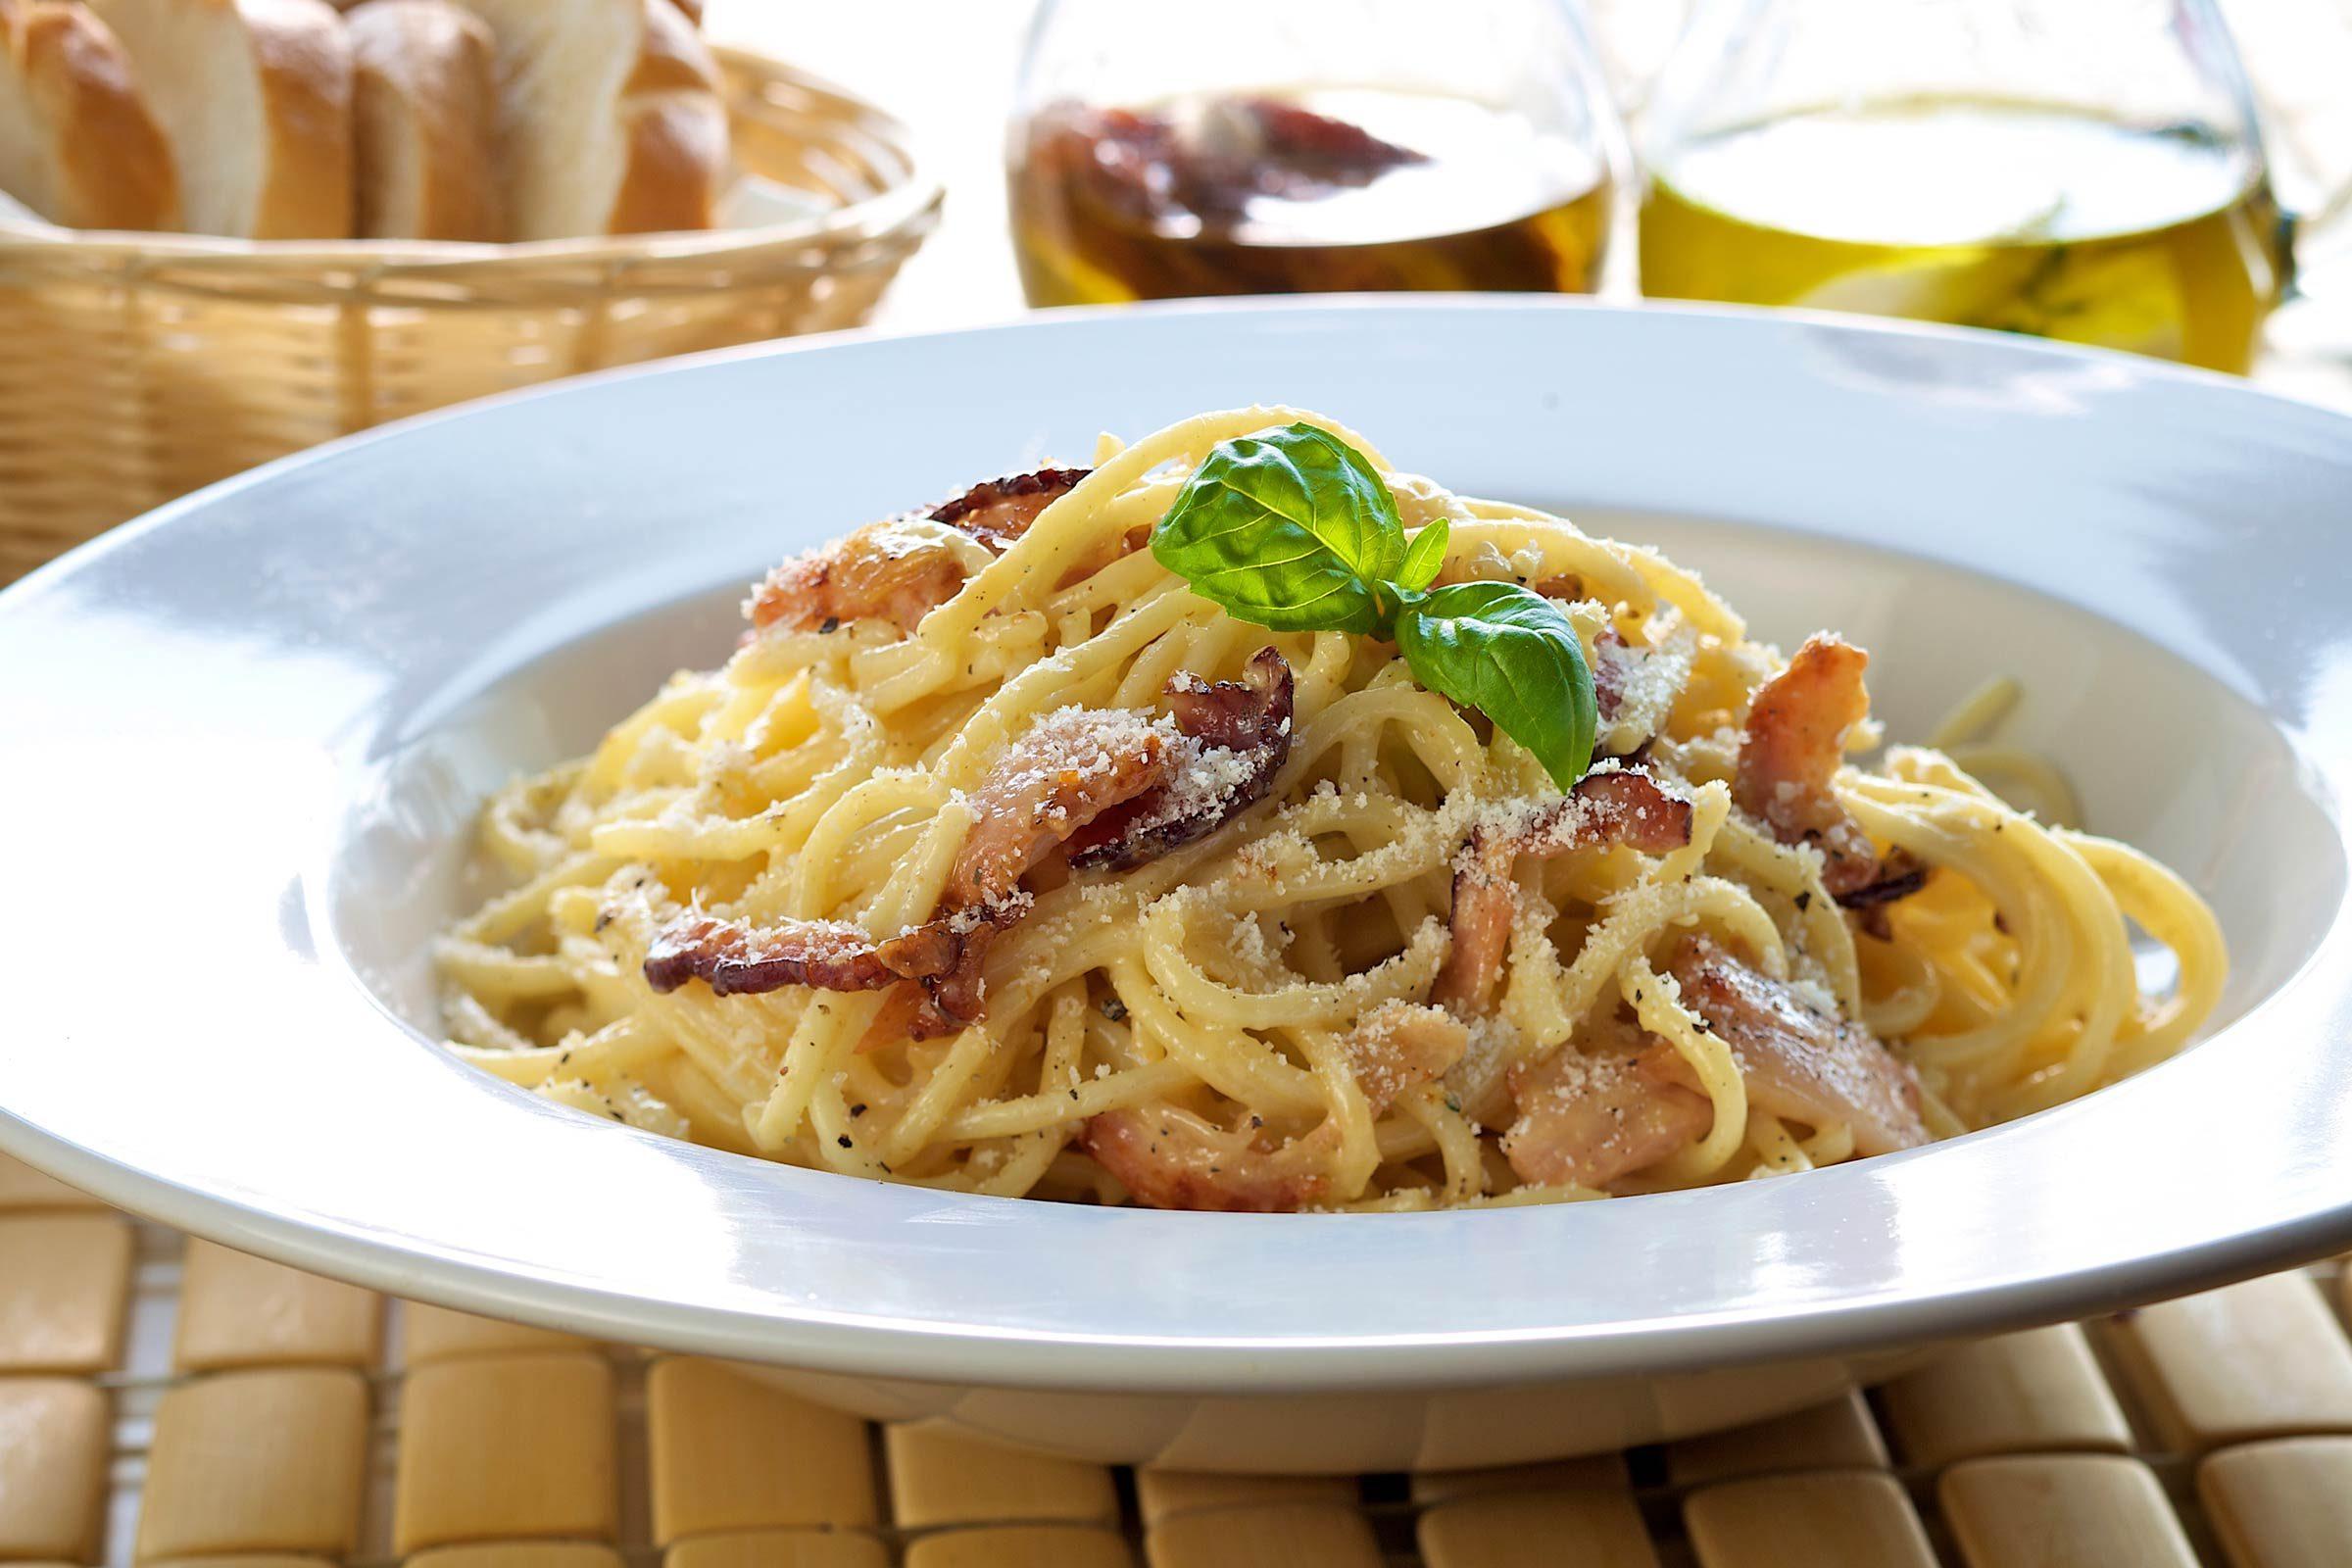 Whip up a simple spaghetti carbonara